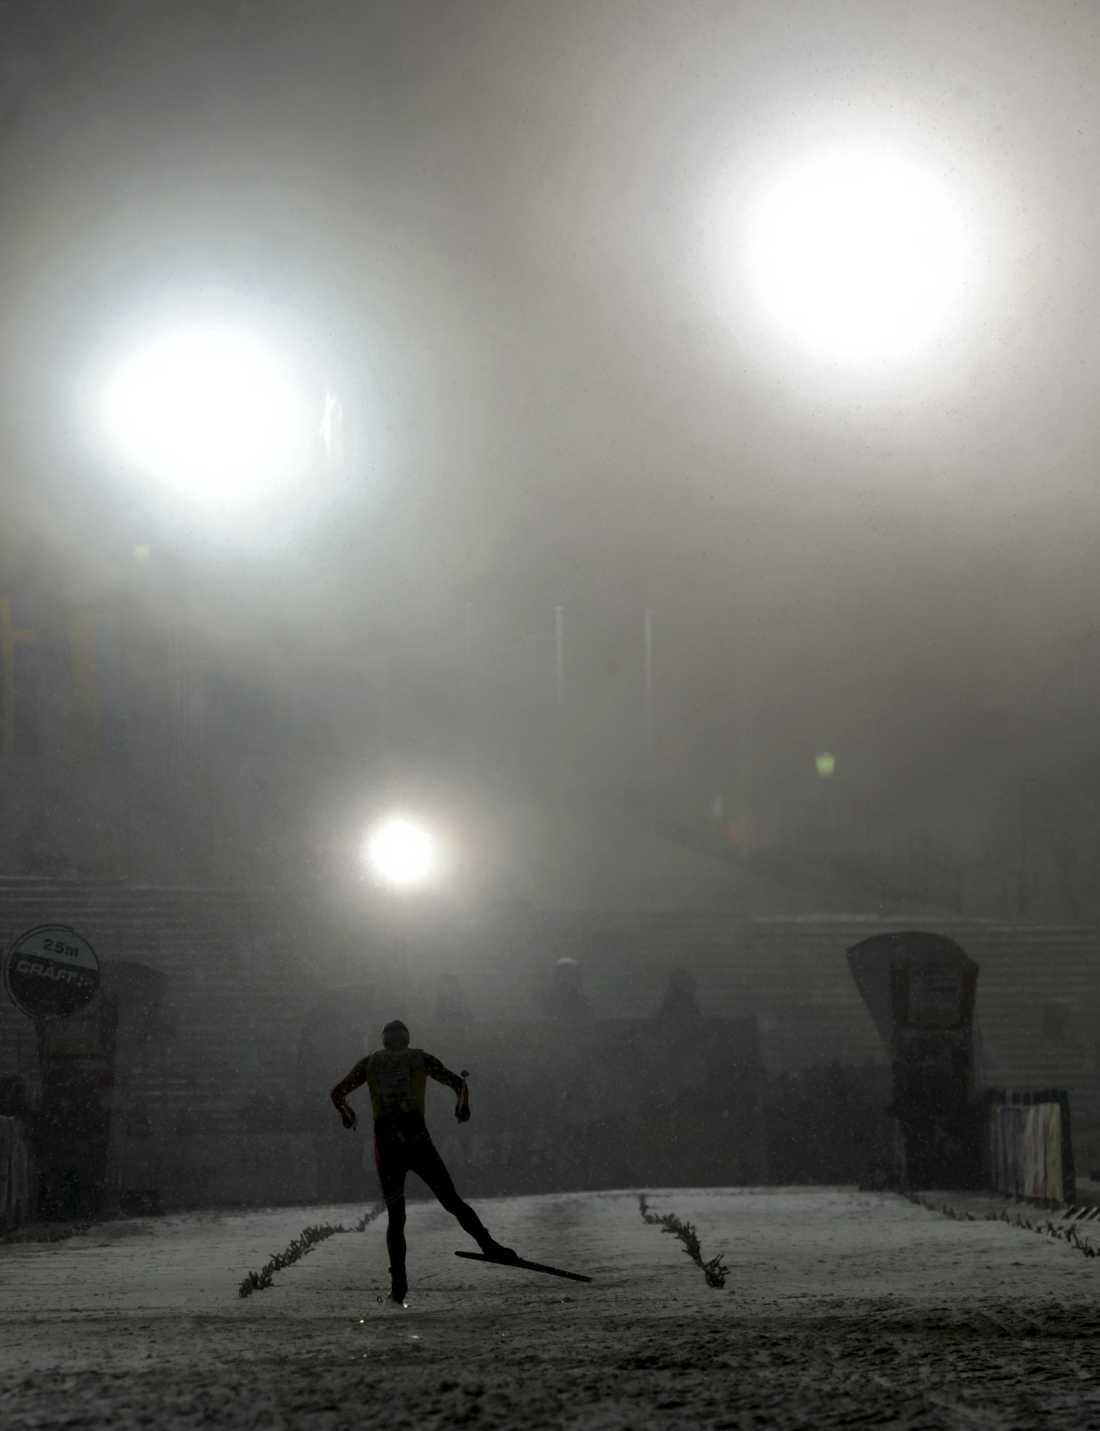 Northug går i mål som vinnare under Tour de Ski i Oberhof, Tyskland 2011.